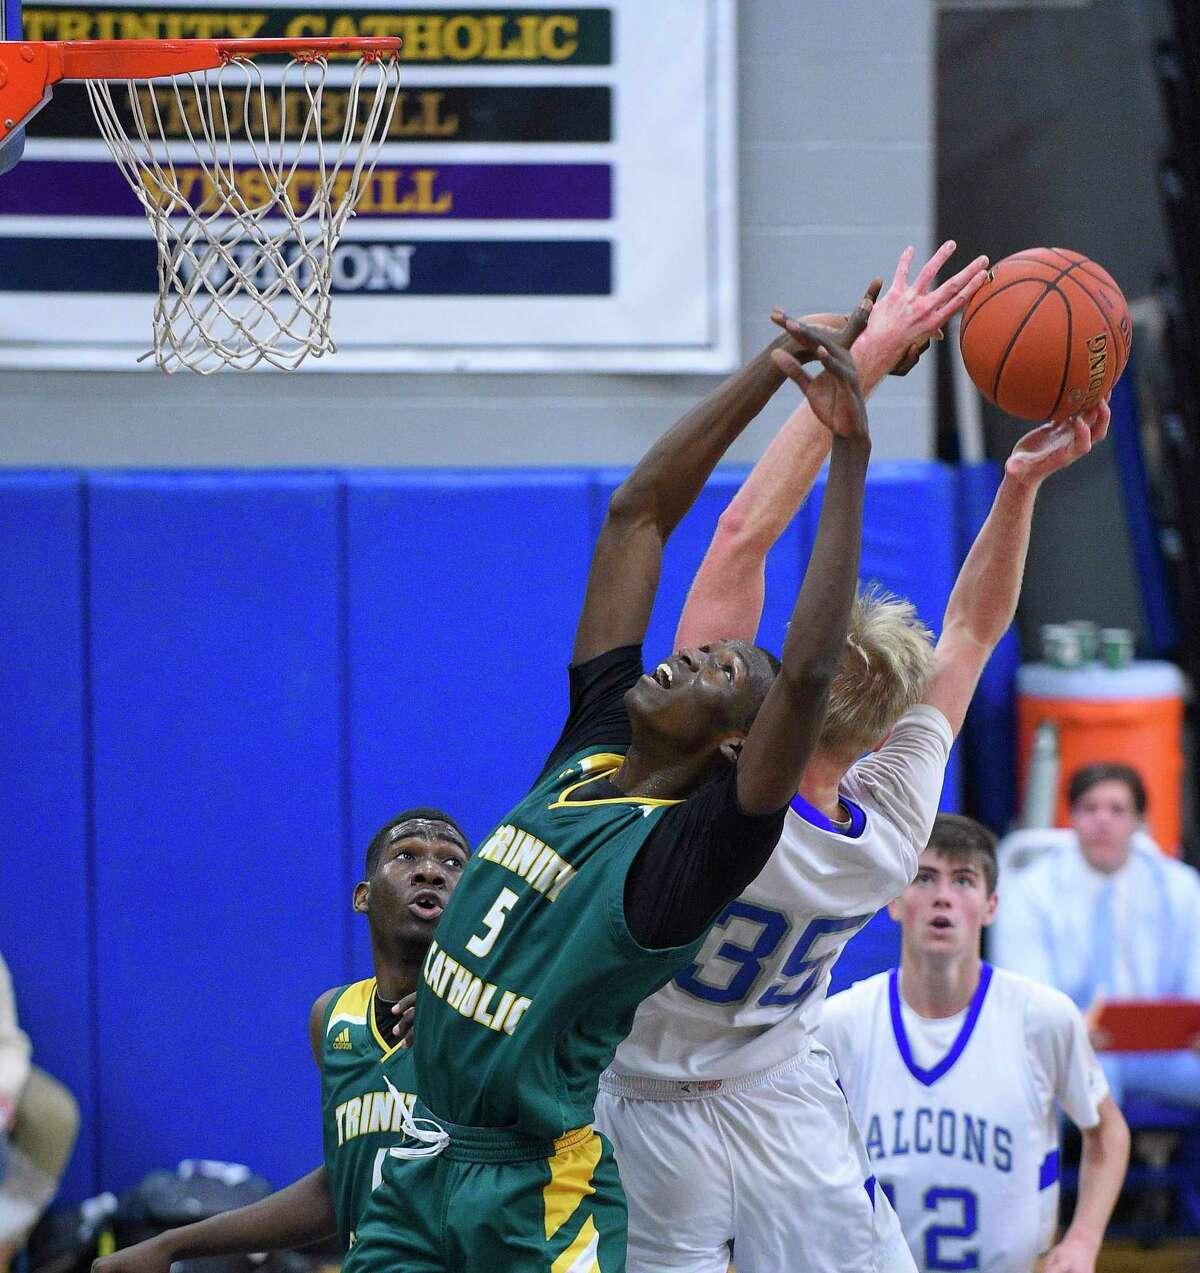 Fairfield Ludlowe's Rowan Keeser (35)grabs a rebound from Trinity Catholic's Rassoul Abakan (5) in a FCIAC boys basketball game on Jan. 14, 2020 in Fairfield, Conn. Fairfield Ludlowe won 68-60.